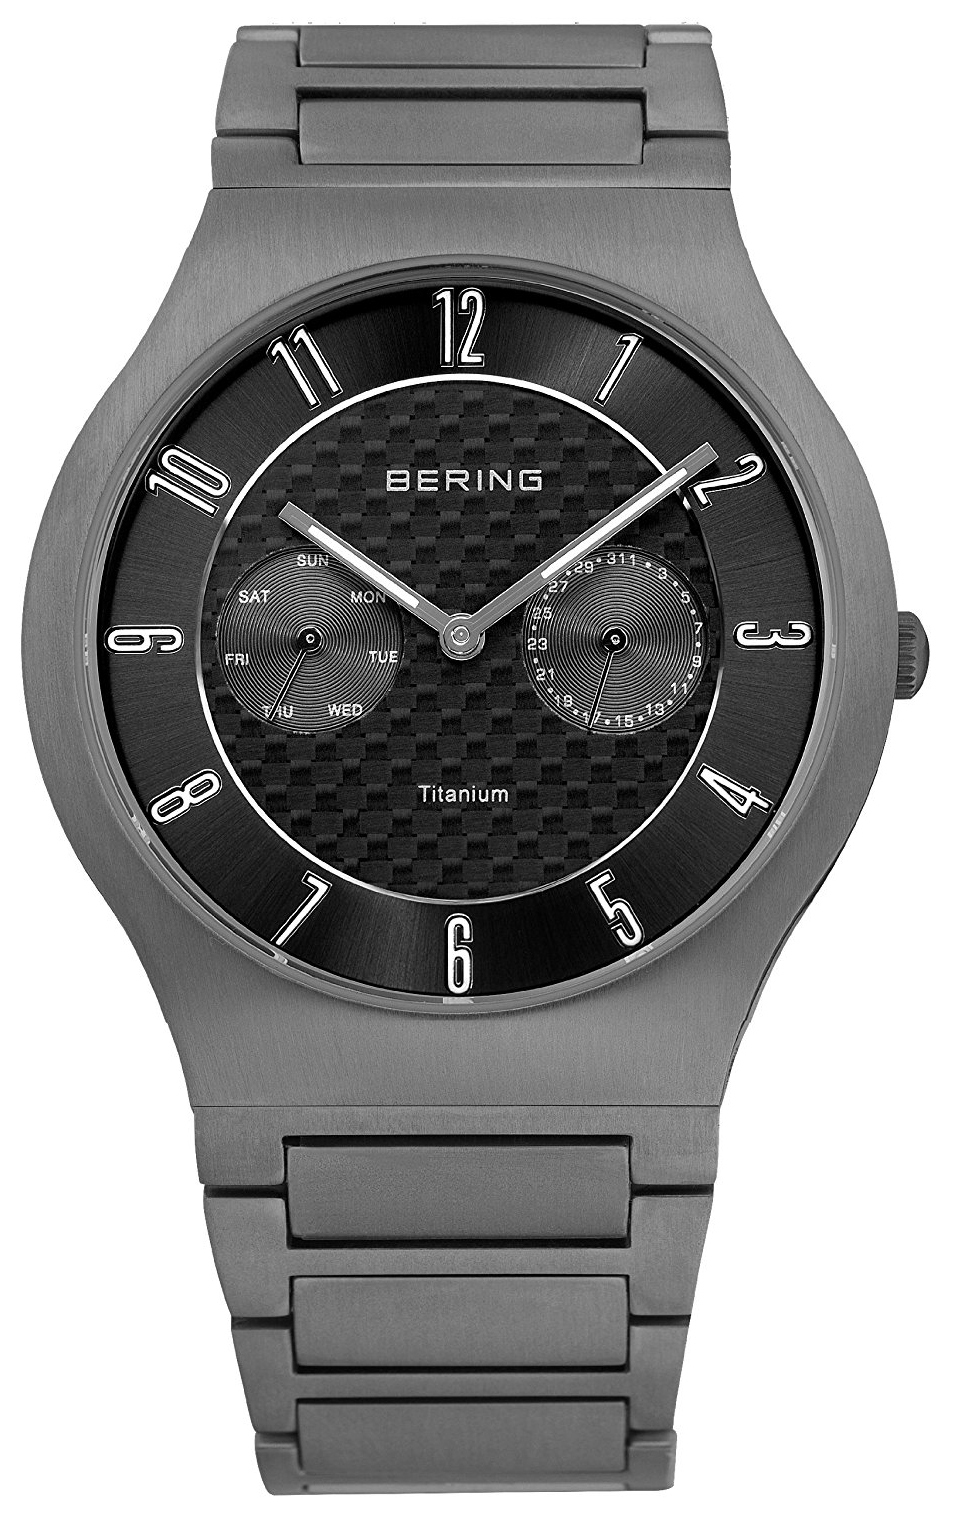 Bering Titanium Herrklocka 11939-777 Grå/Titan Ø39 mm - Bering